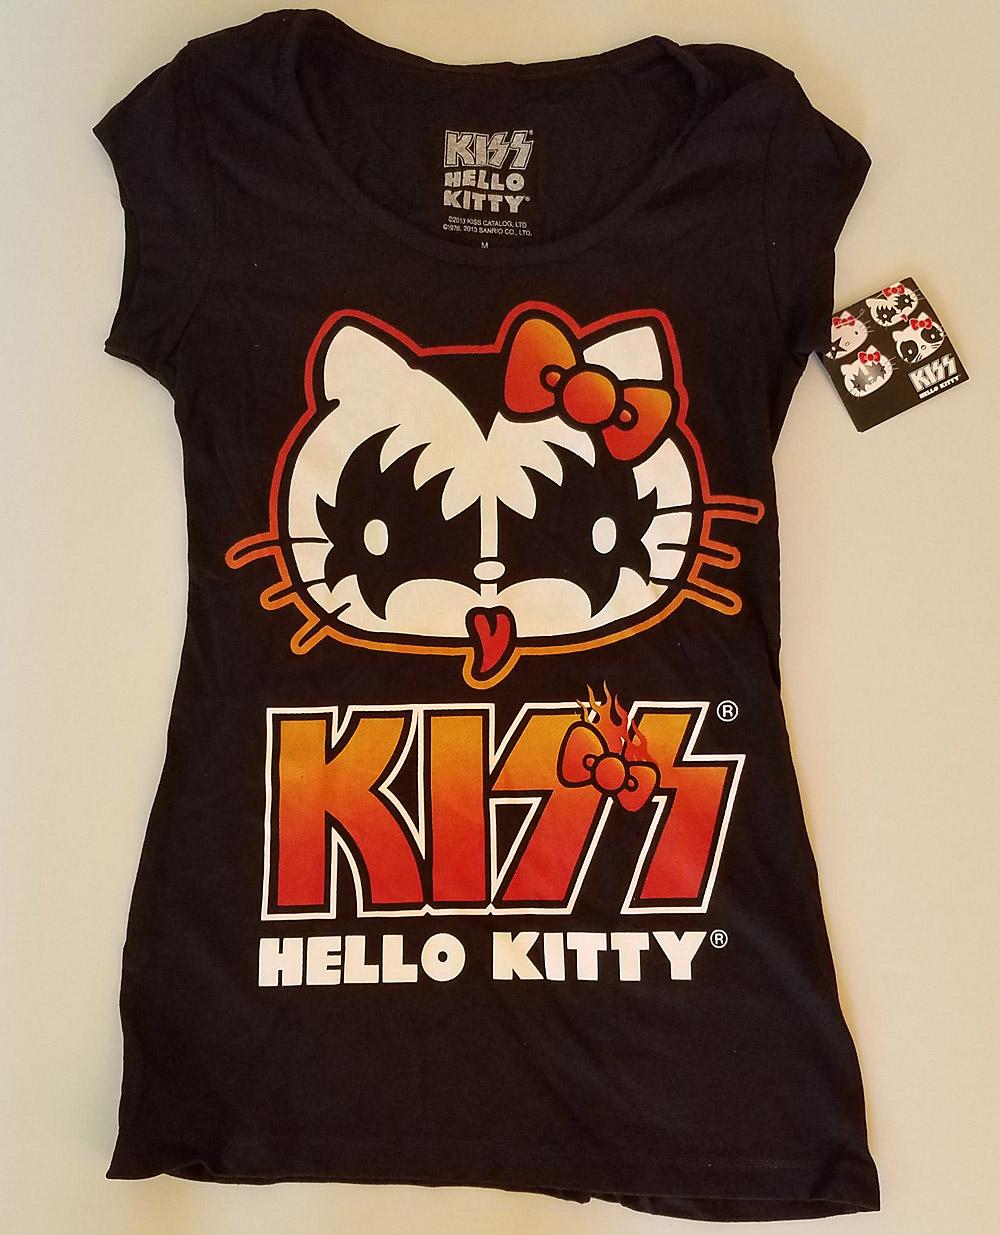 f46b5a36cb1 Women s Hello Kitty KISS Gene Kitty Baby Doll T-Shirt – KISS Addiction